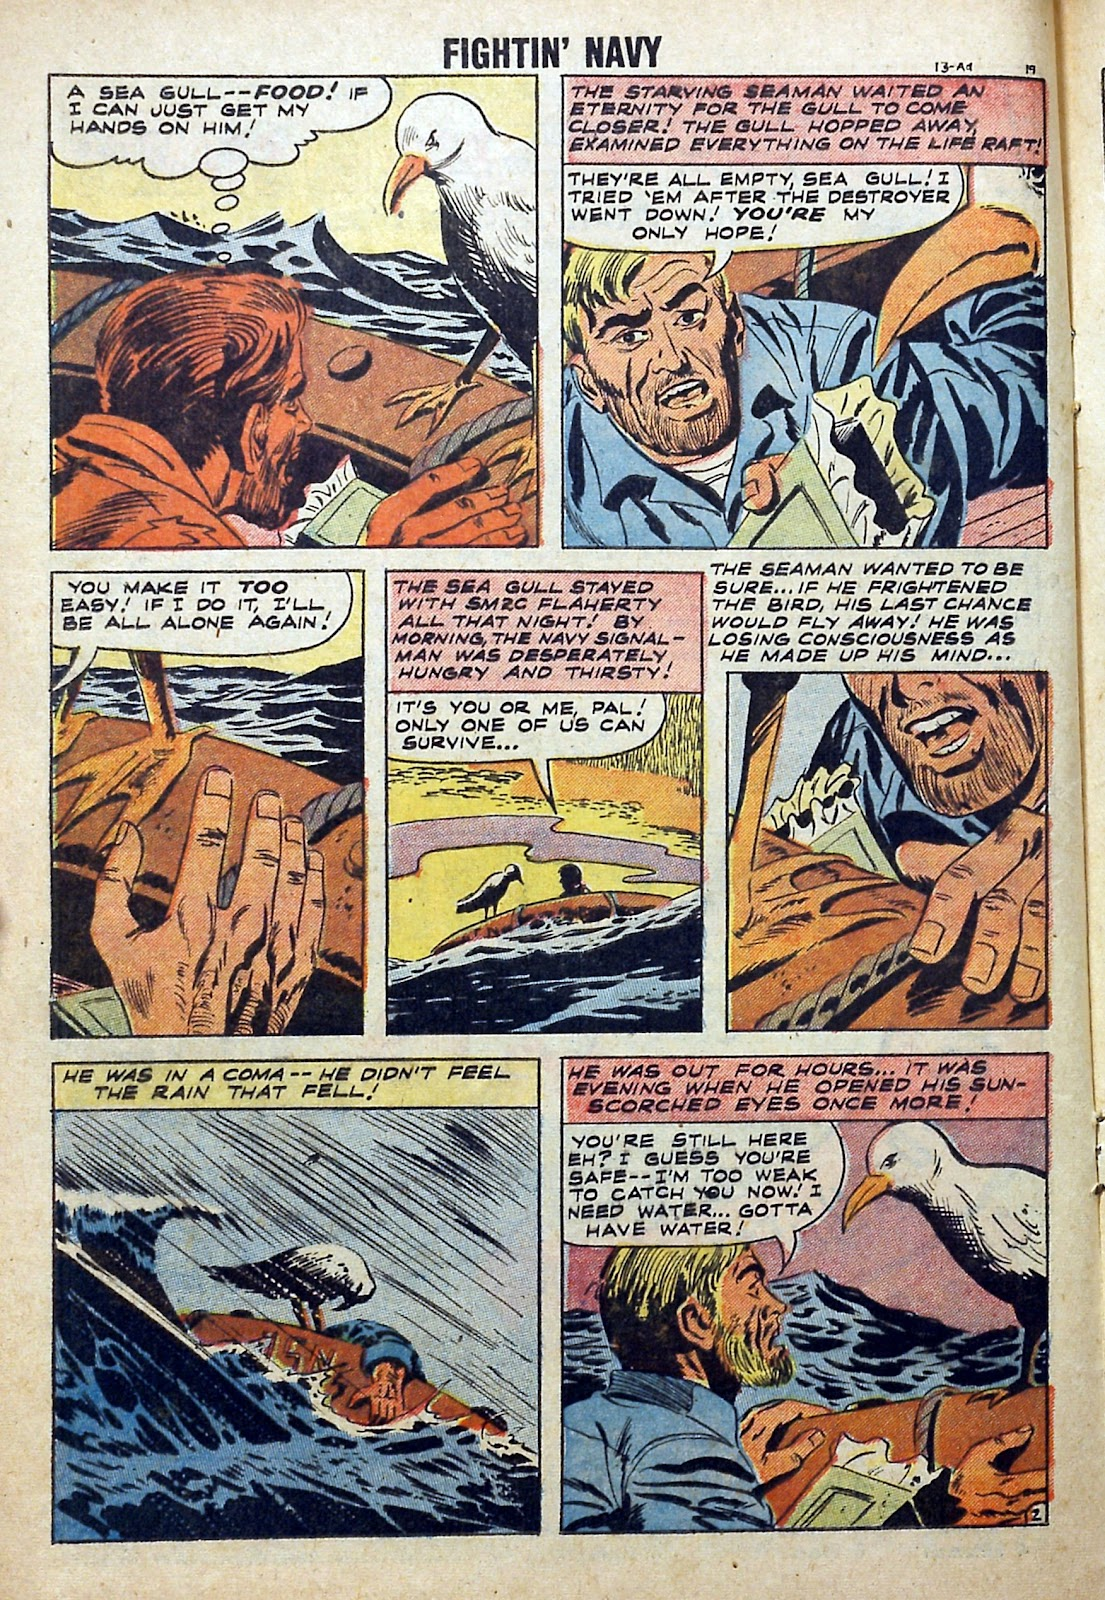 Read online Fightin' Navy comic -  Issue #84 - 16